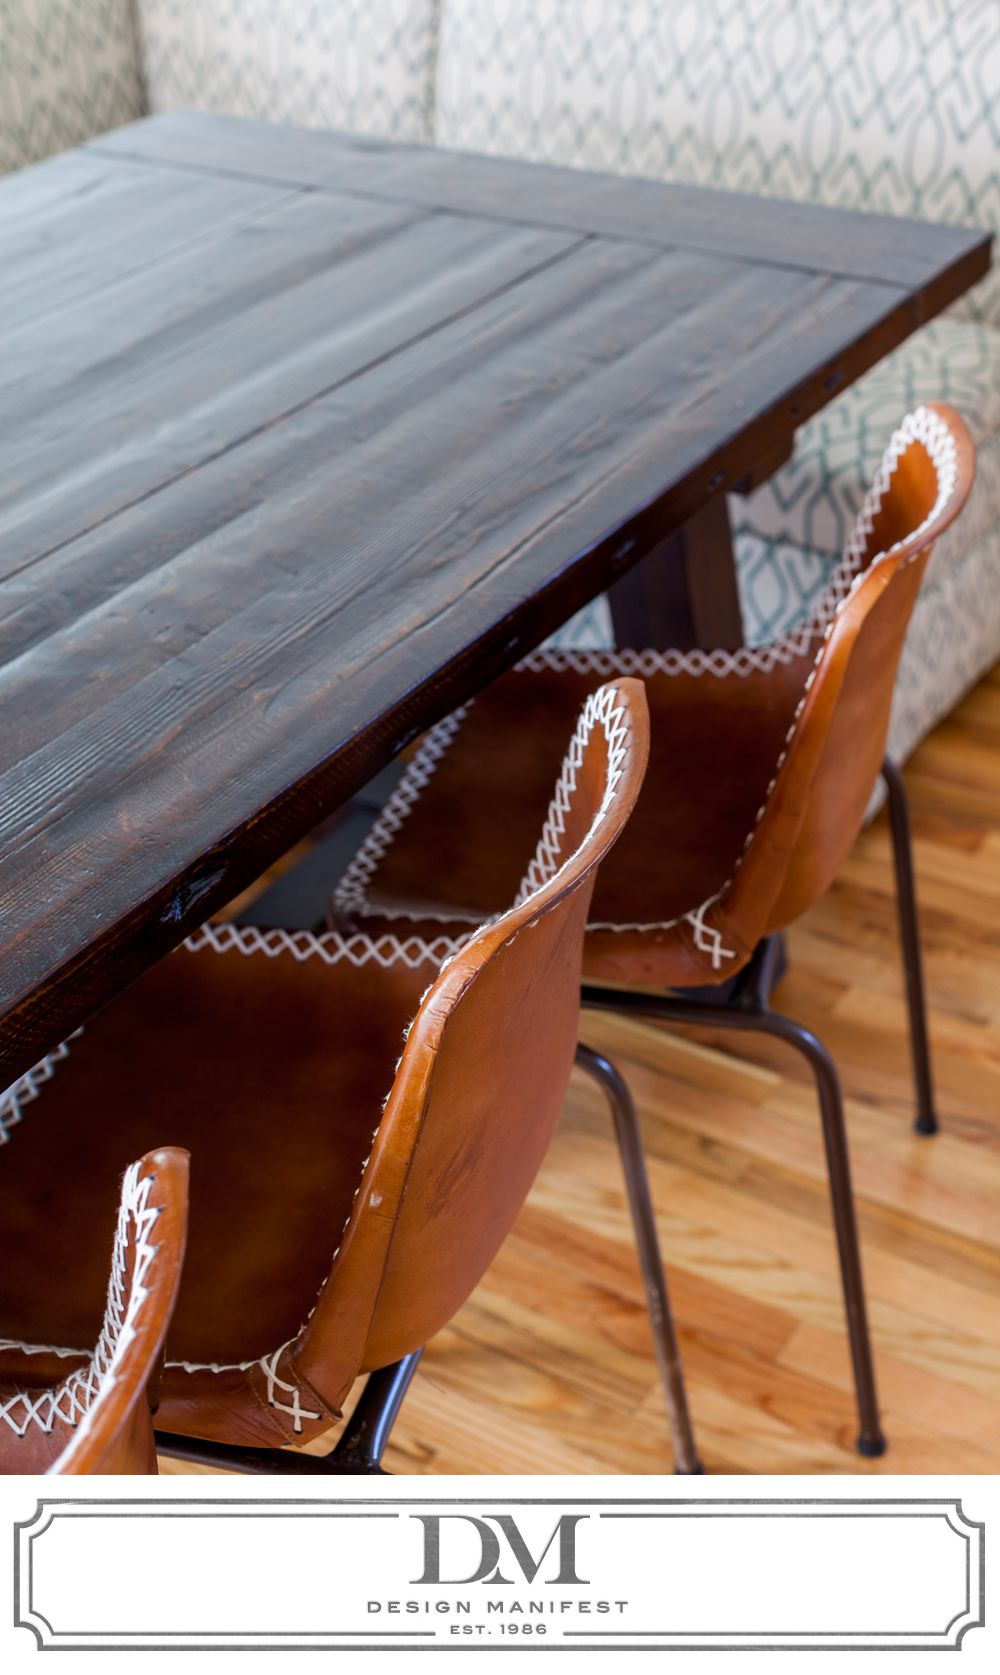 Before And After Villanova Modern Organic Dining Room Design Manifest Organic Dining Room Organic Modern Rustic Farm Table